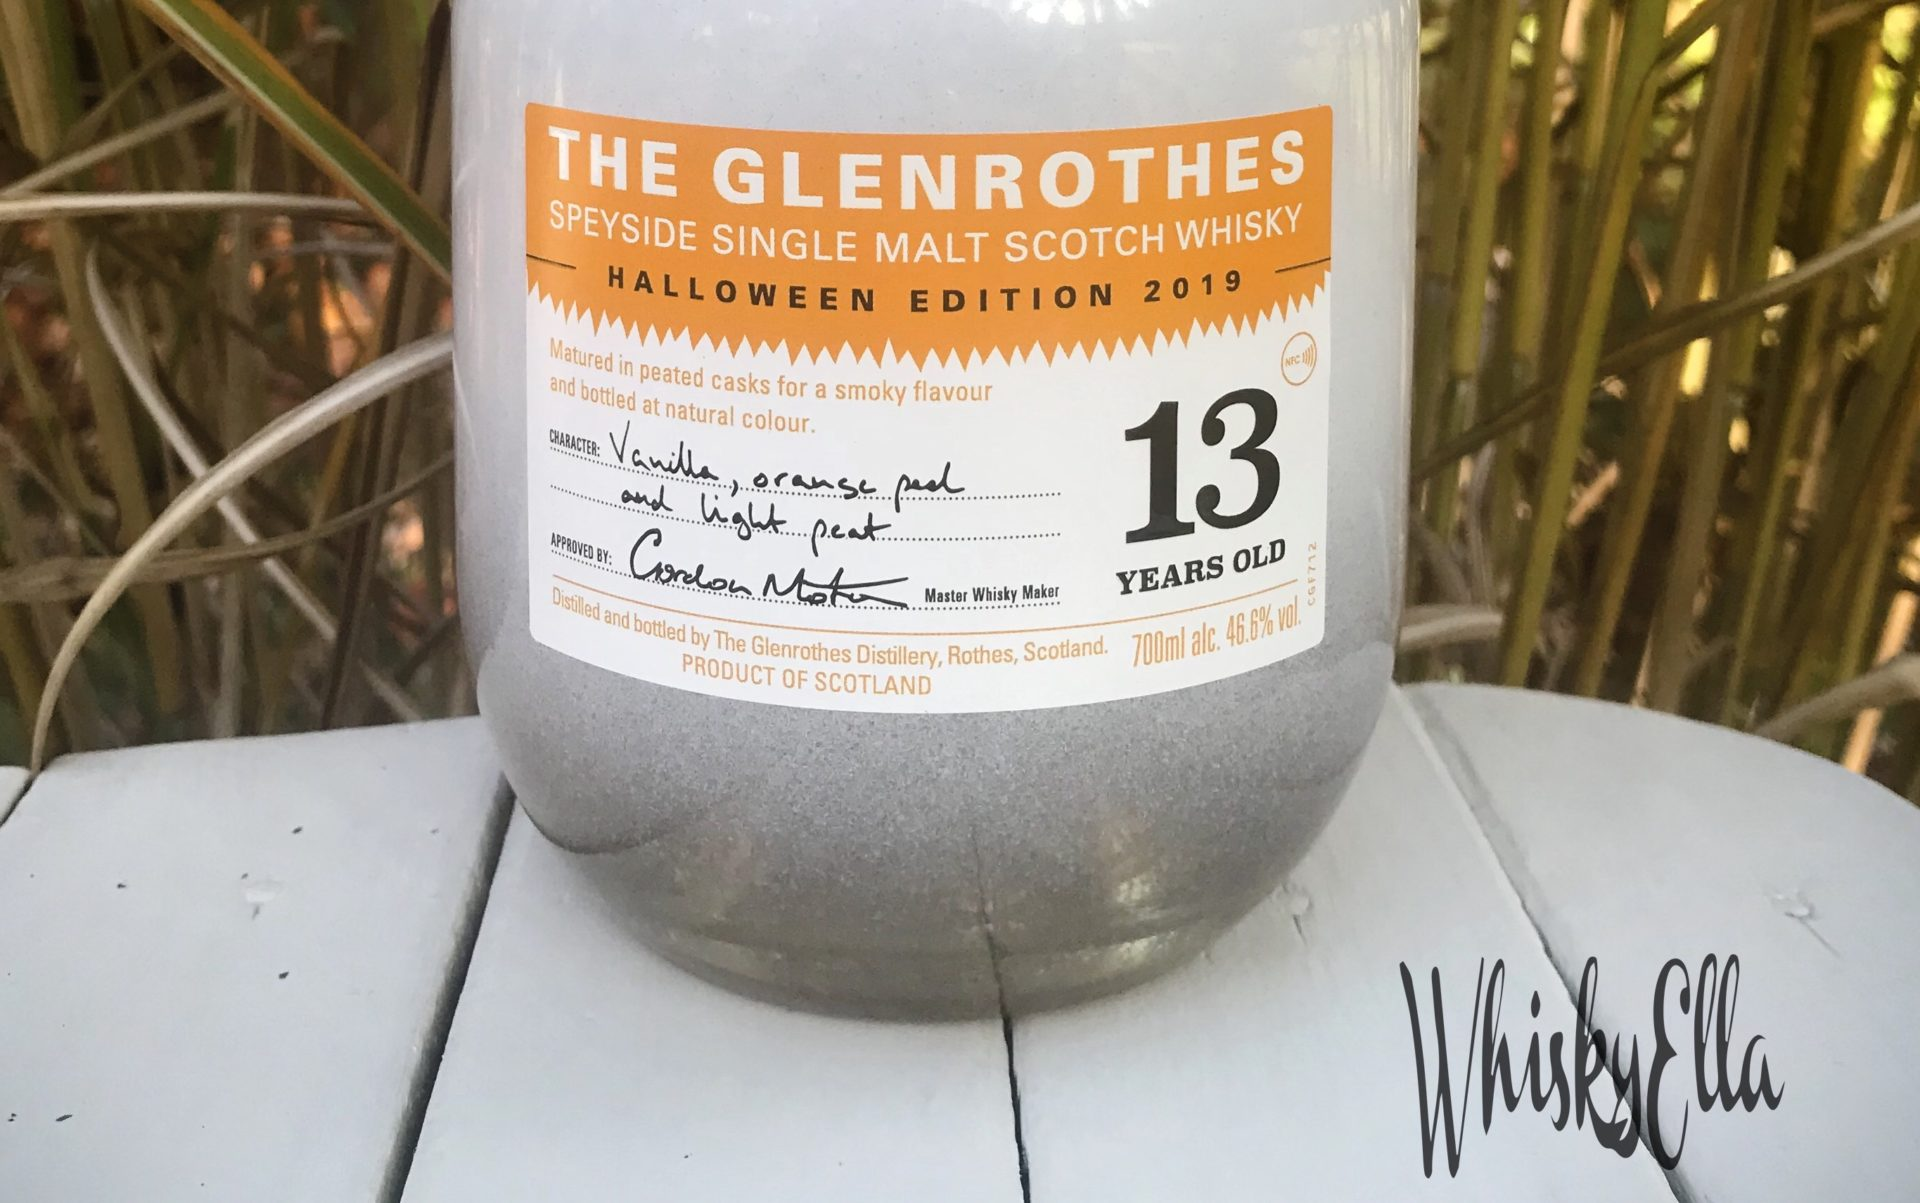 Nasza recenzja Glenrothes Halloween Edition 2019 13 yo #42